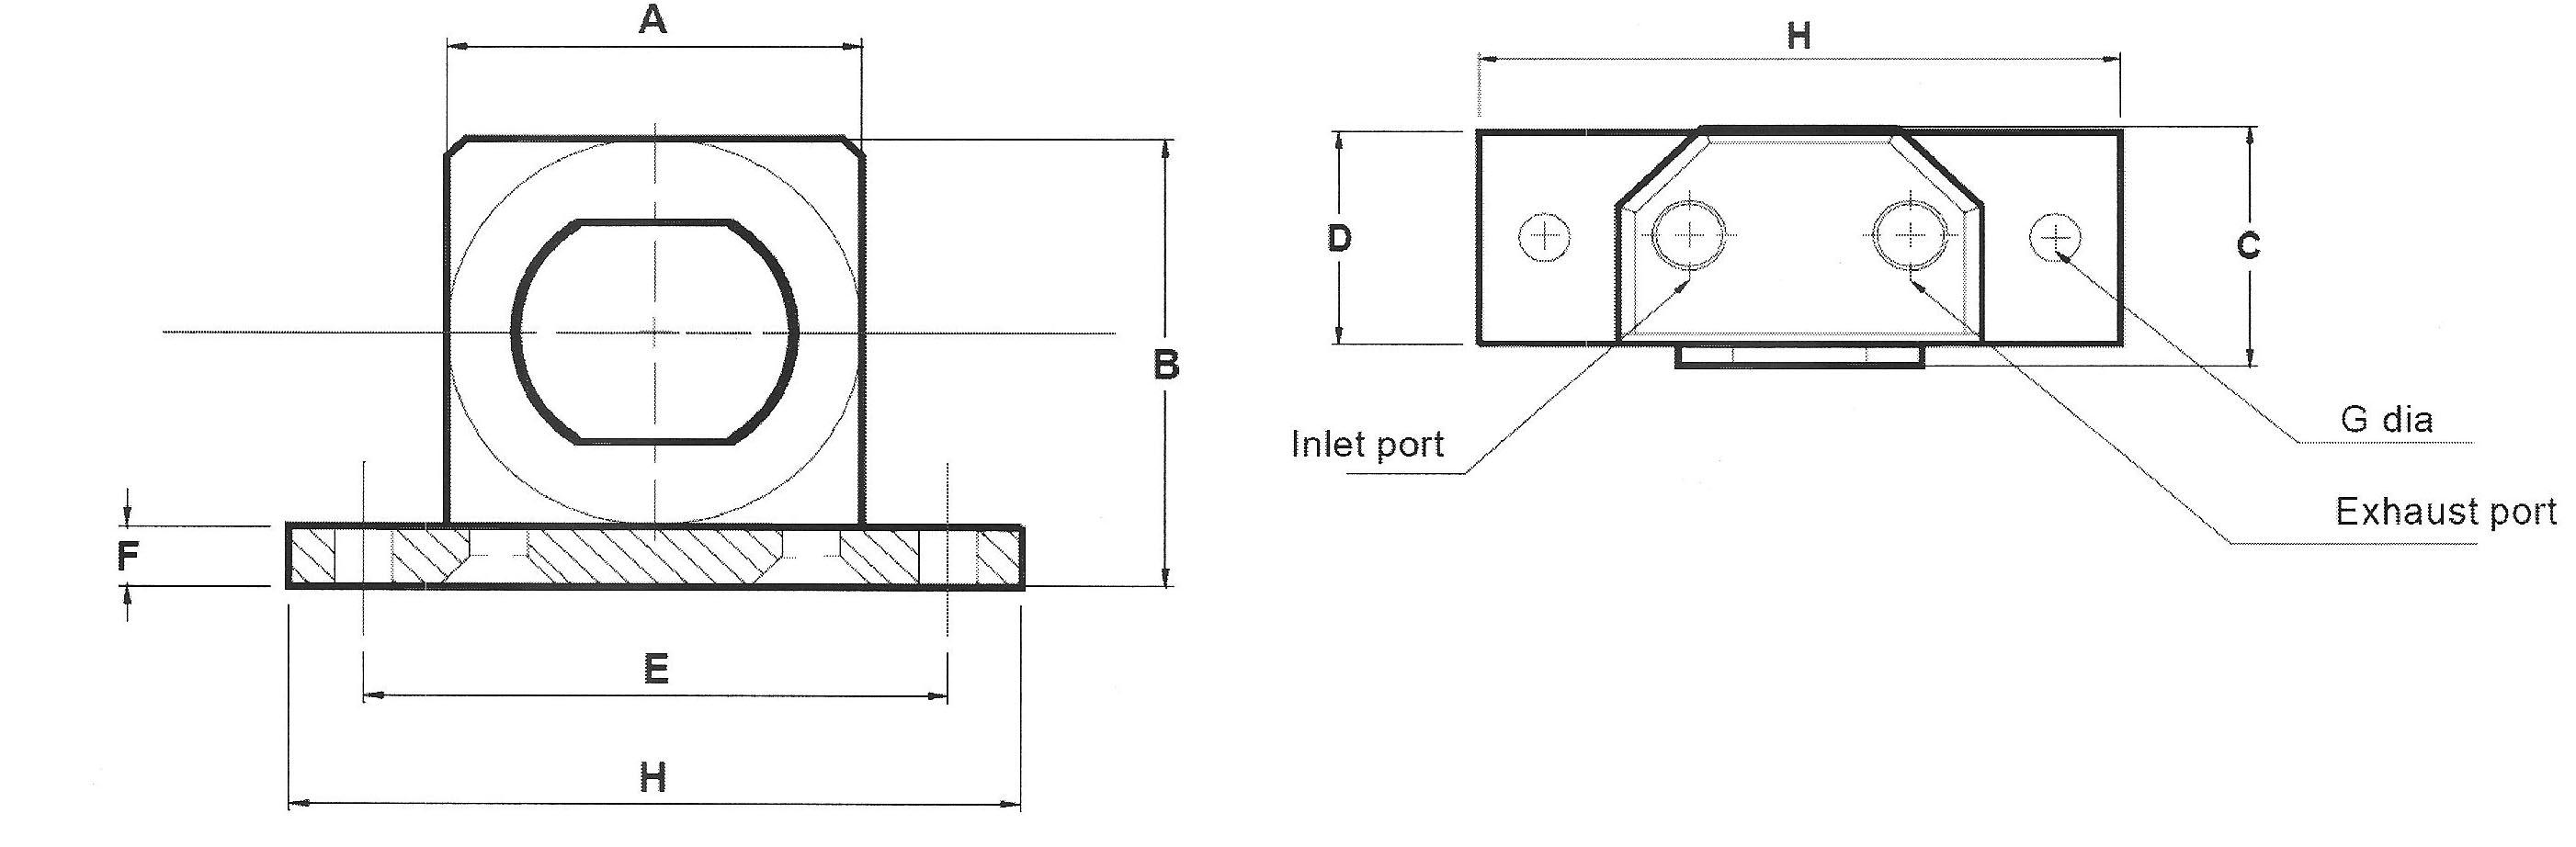 GT SS Diagram